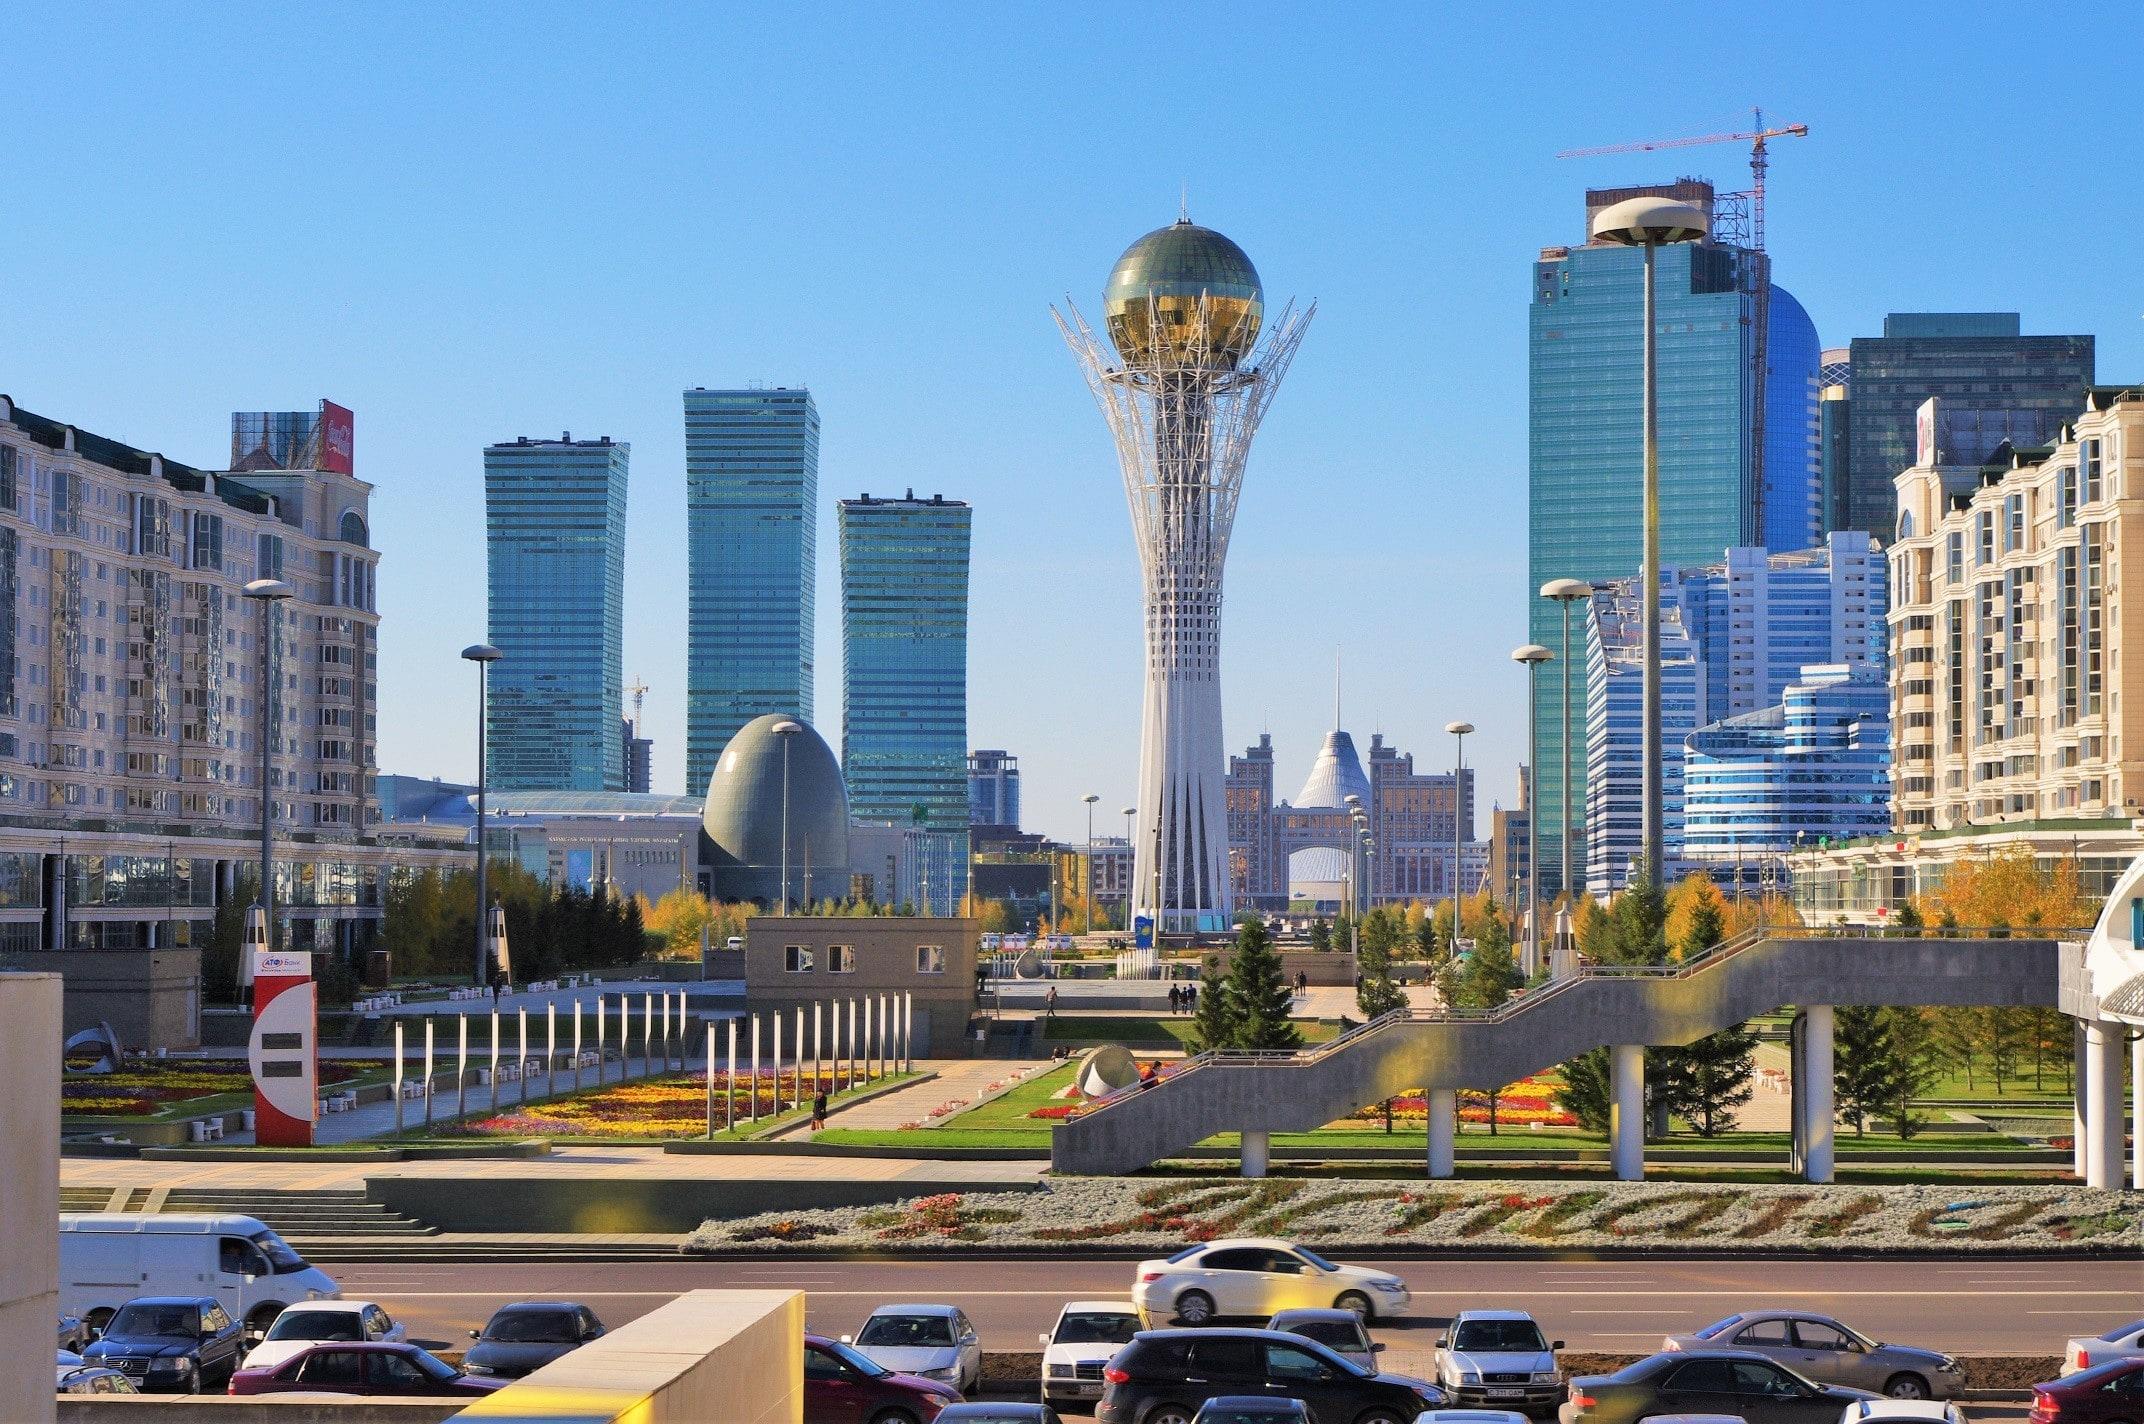 Nowa stolica Kazachstanu